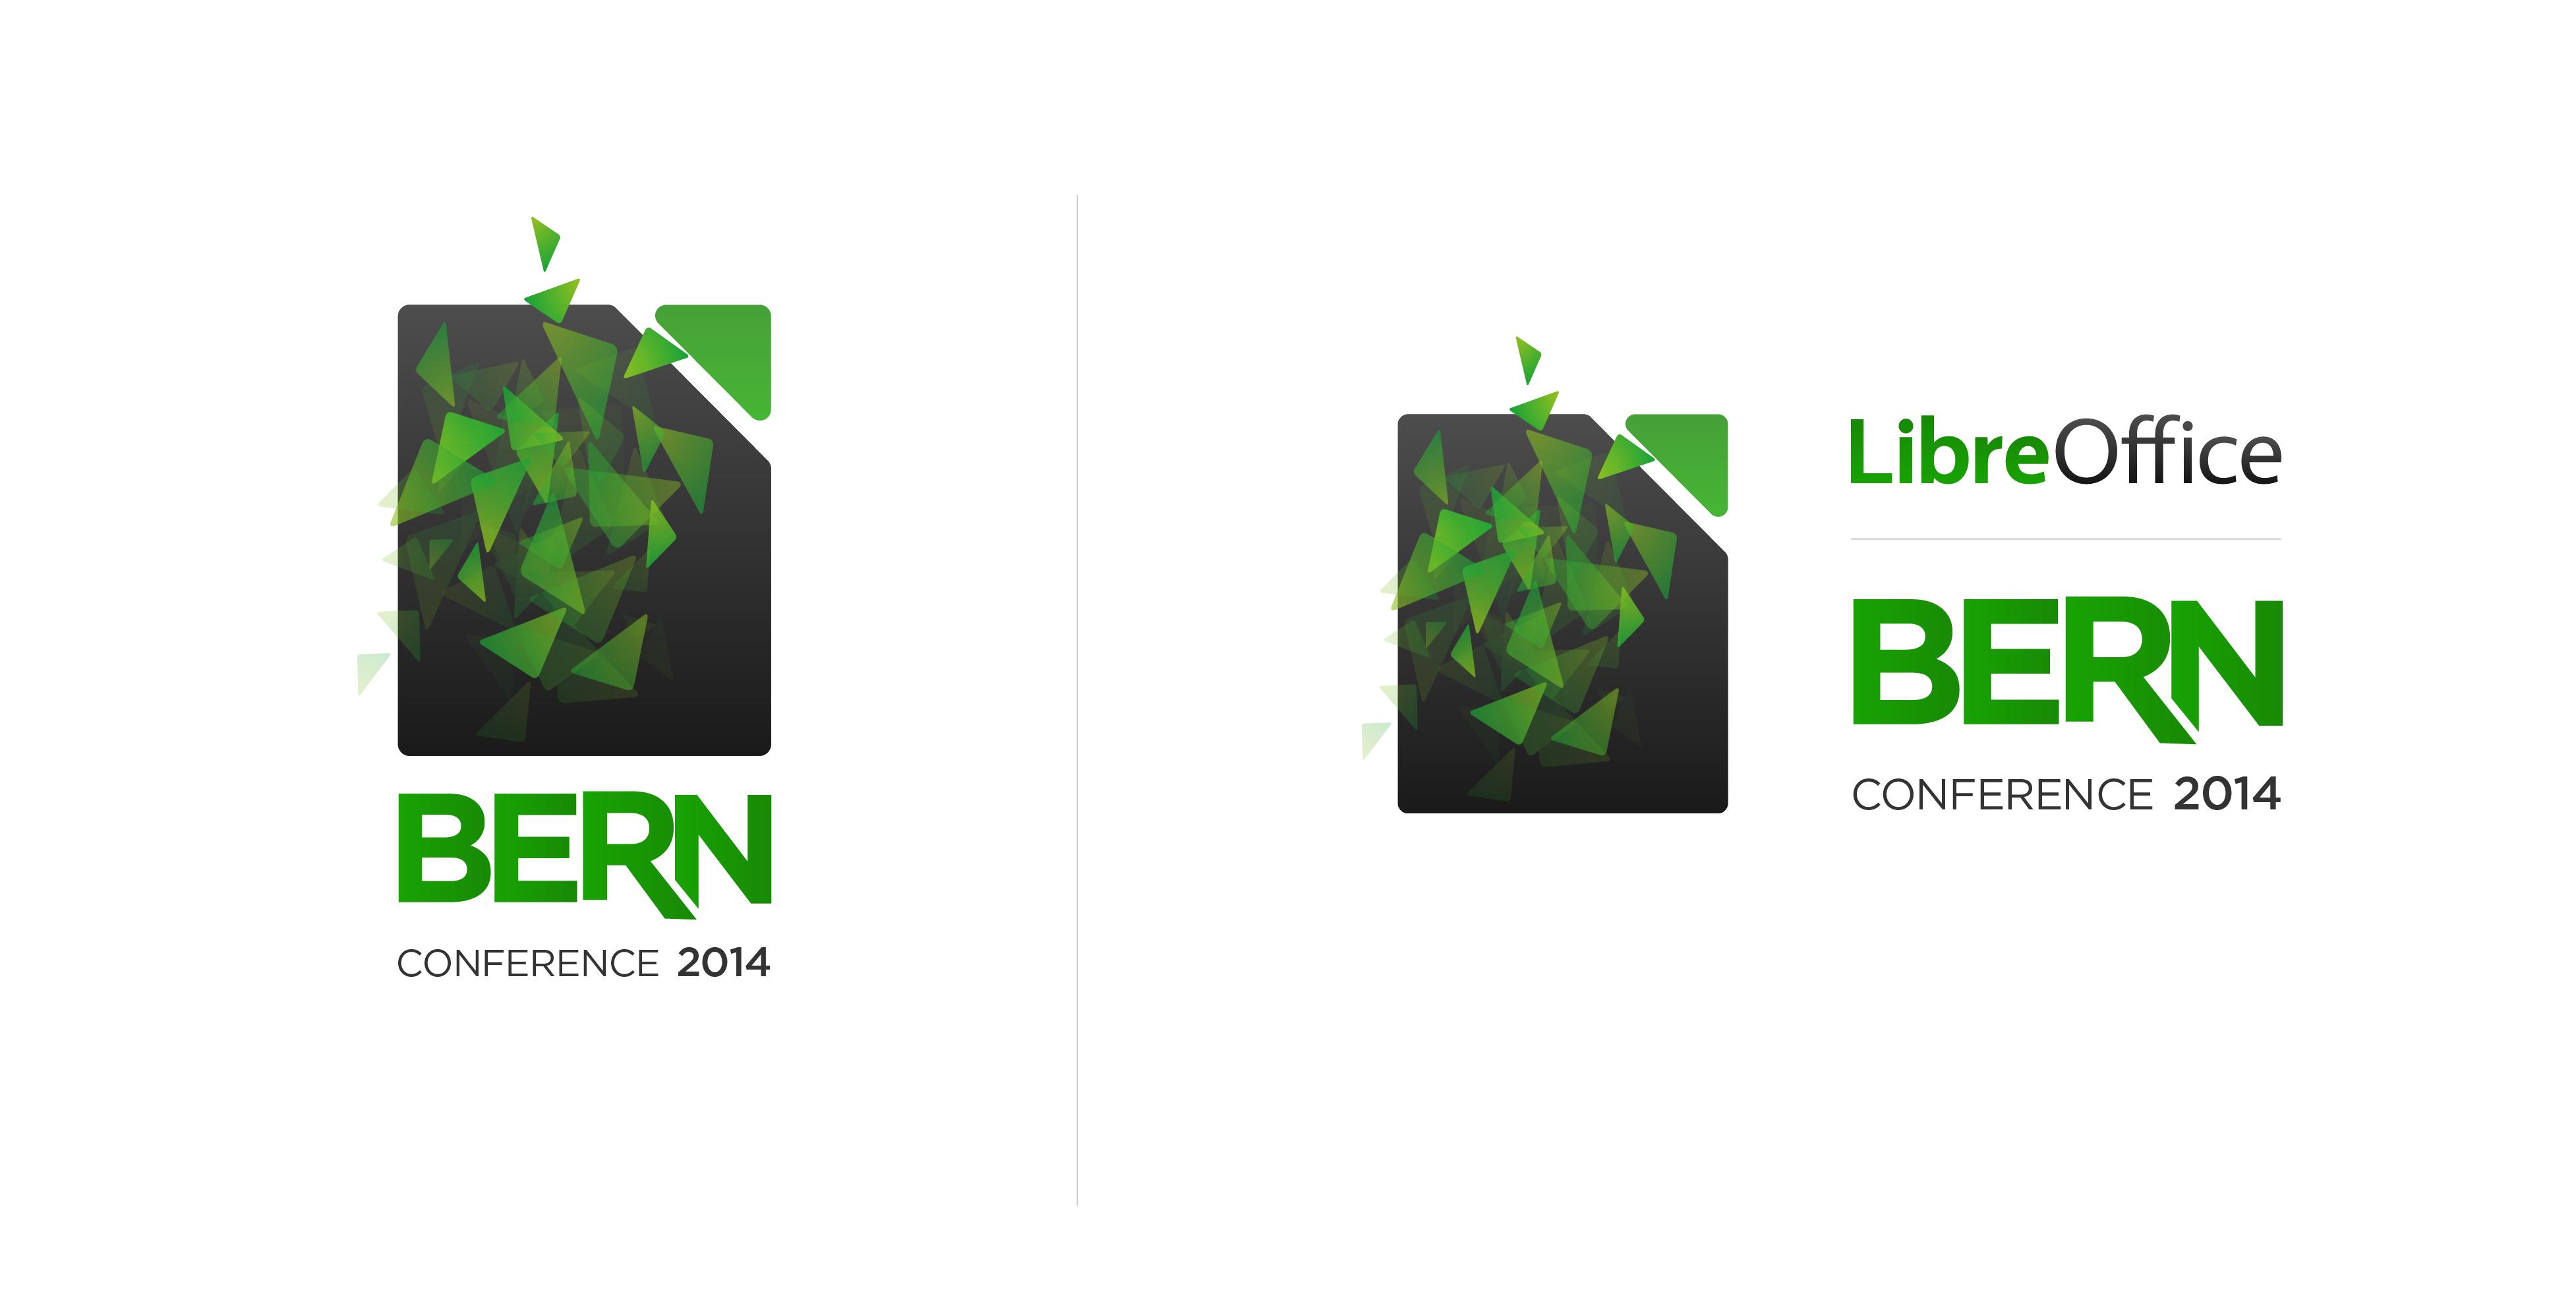 bern-logo-com-07.png